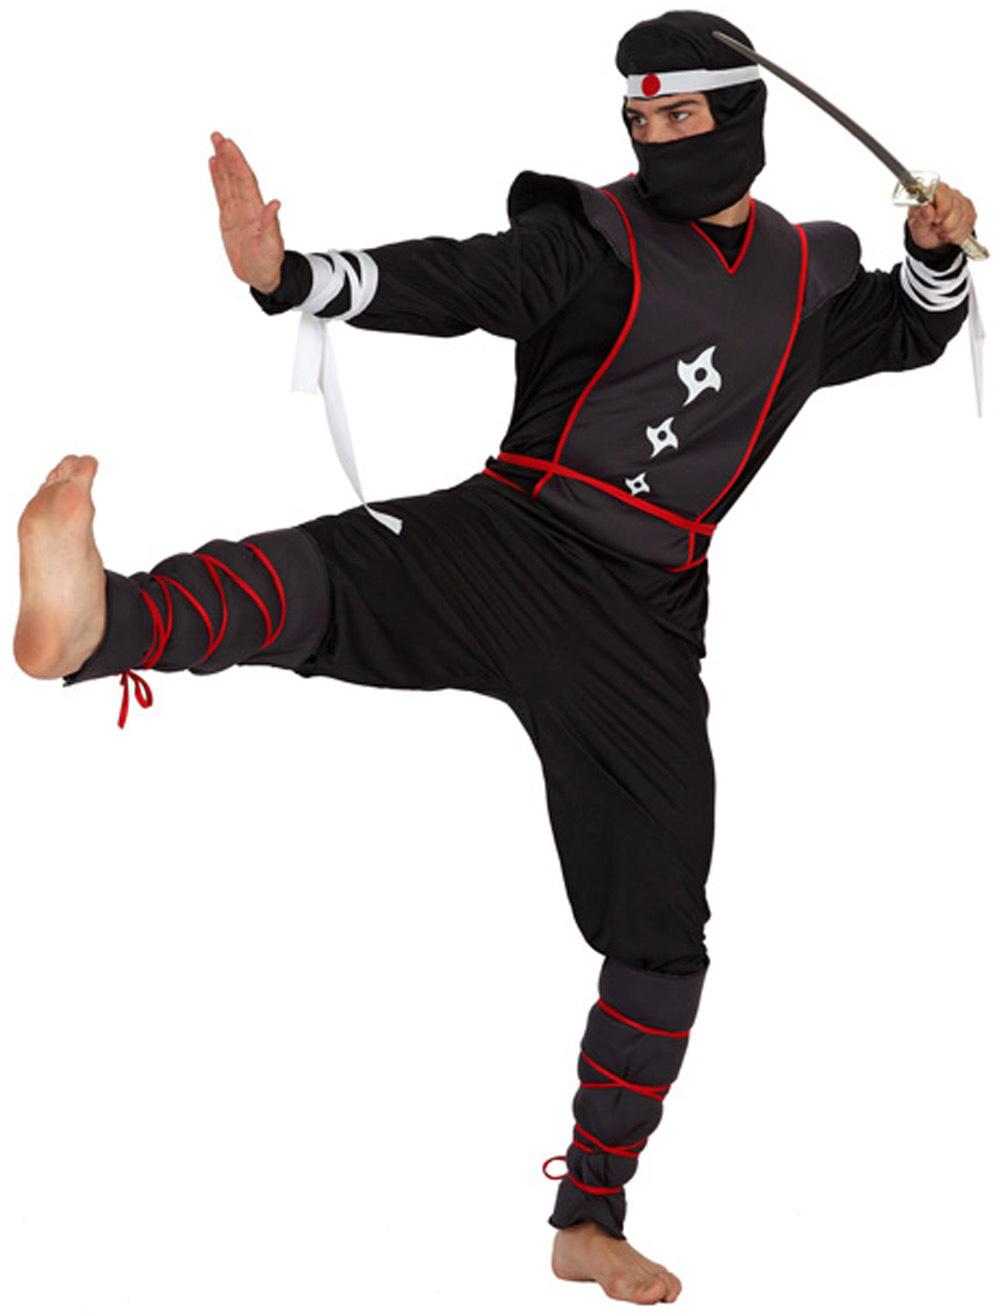 d6f95e7e117035 Déguisement ninja adulte   Guerrier ninja homme